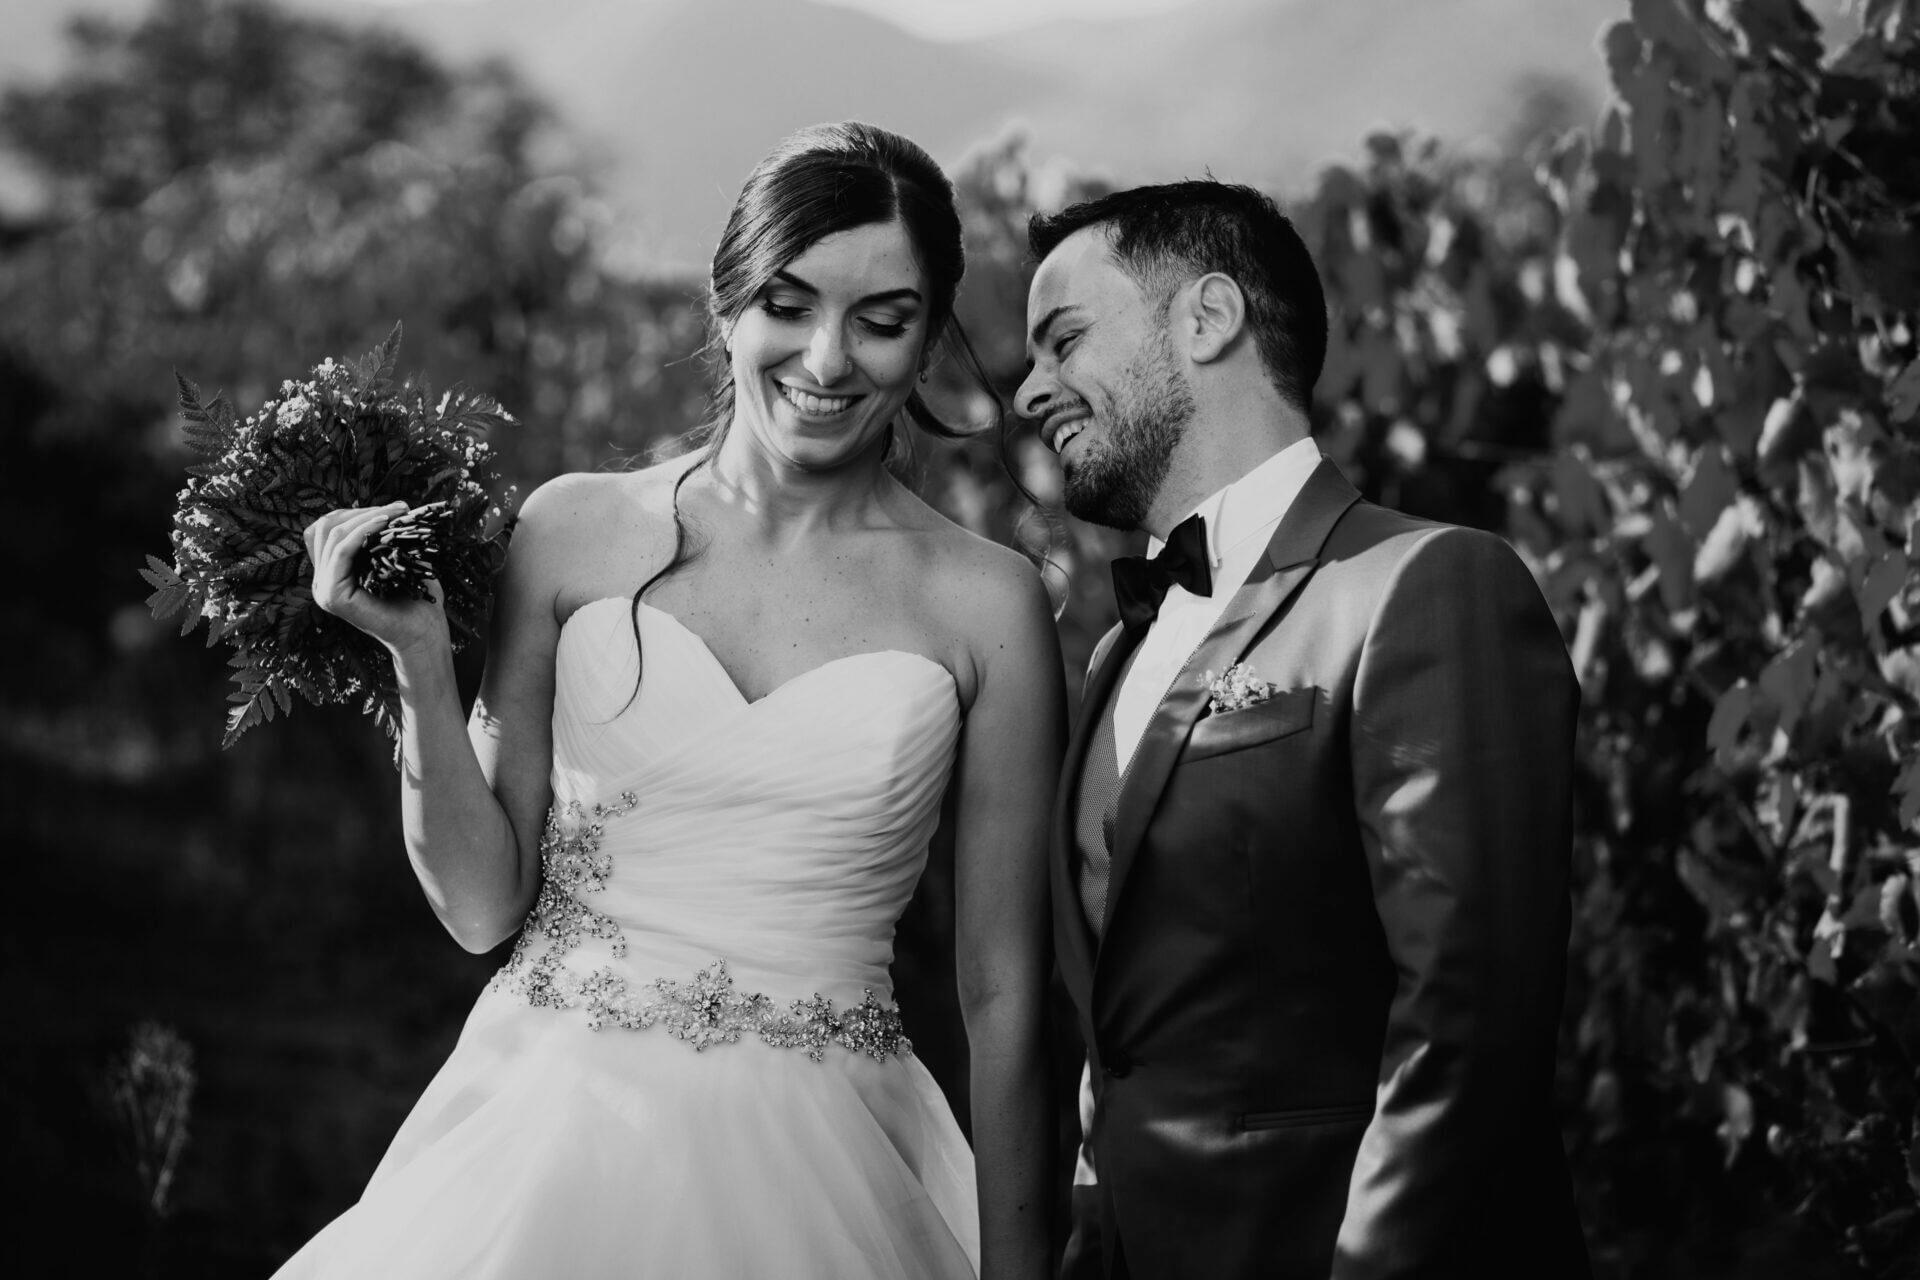 emanuela marino fotografia matrimonio